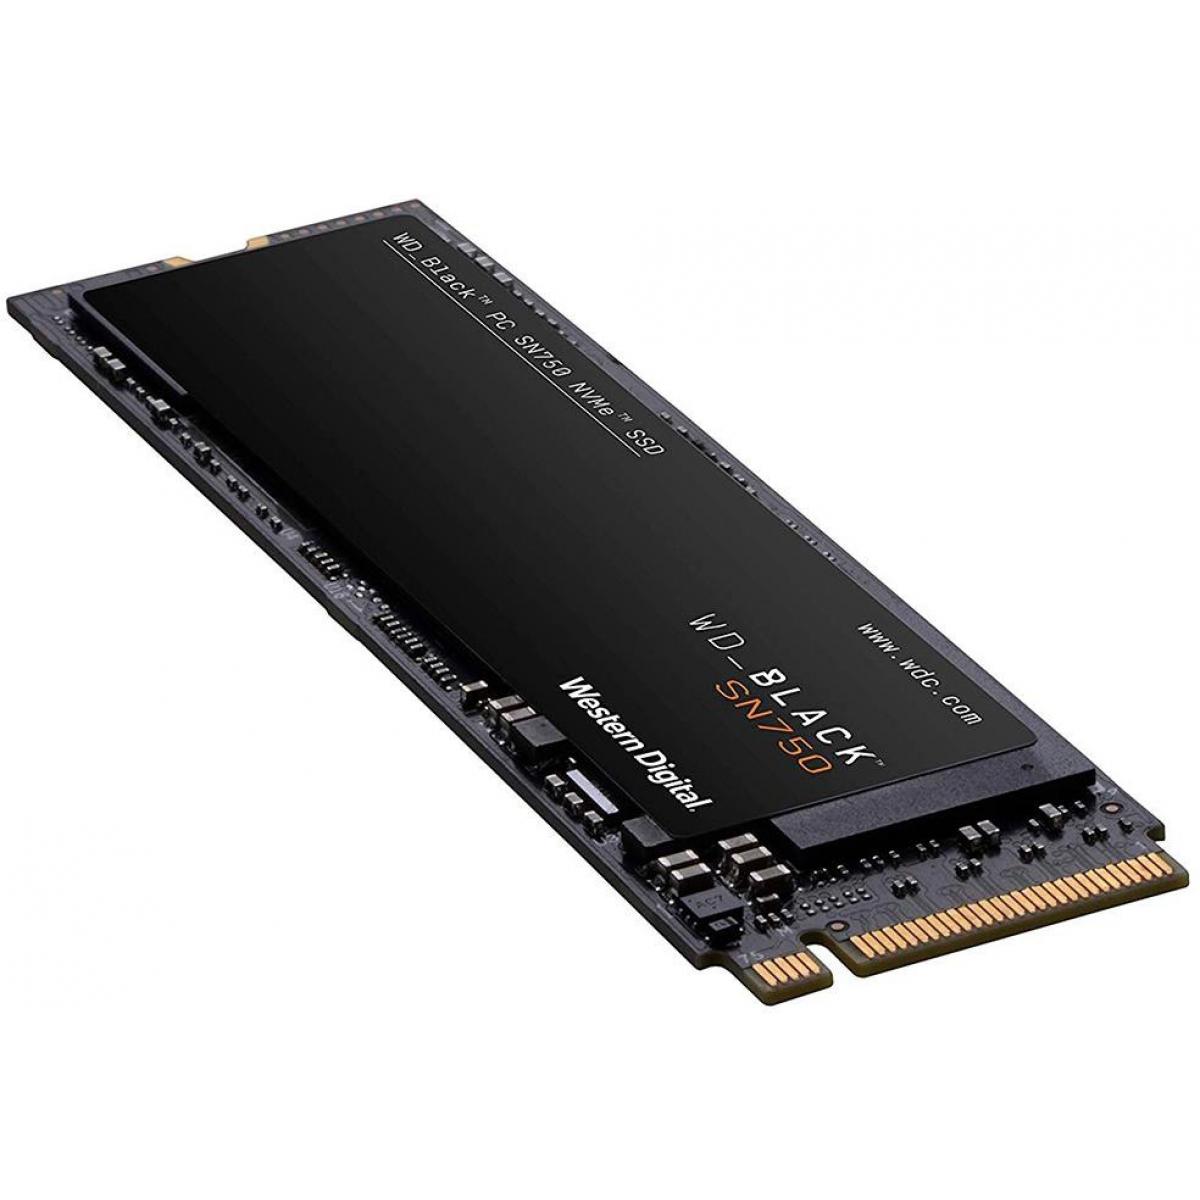 SSD WD Black SN750 250GB, M.2 2280, Leitura 3100MBs e Gravação 1600MBs, WDS250G3X0C